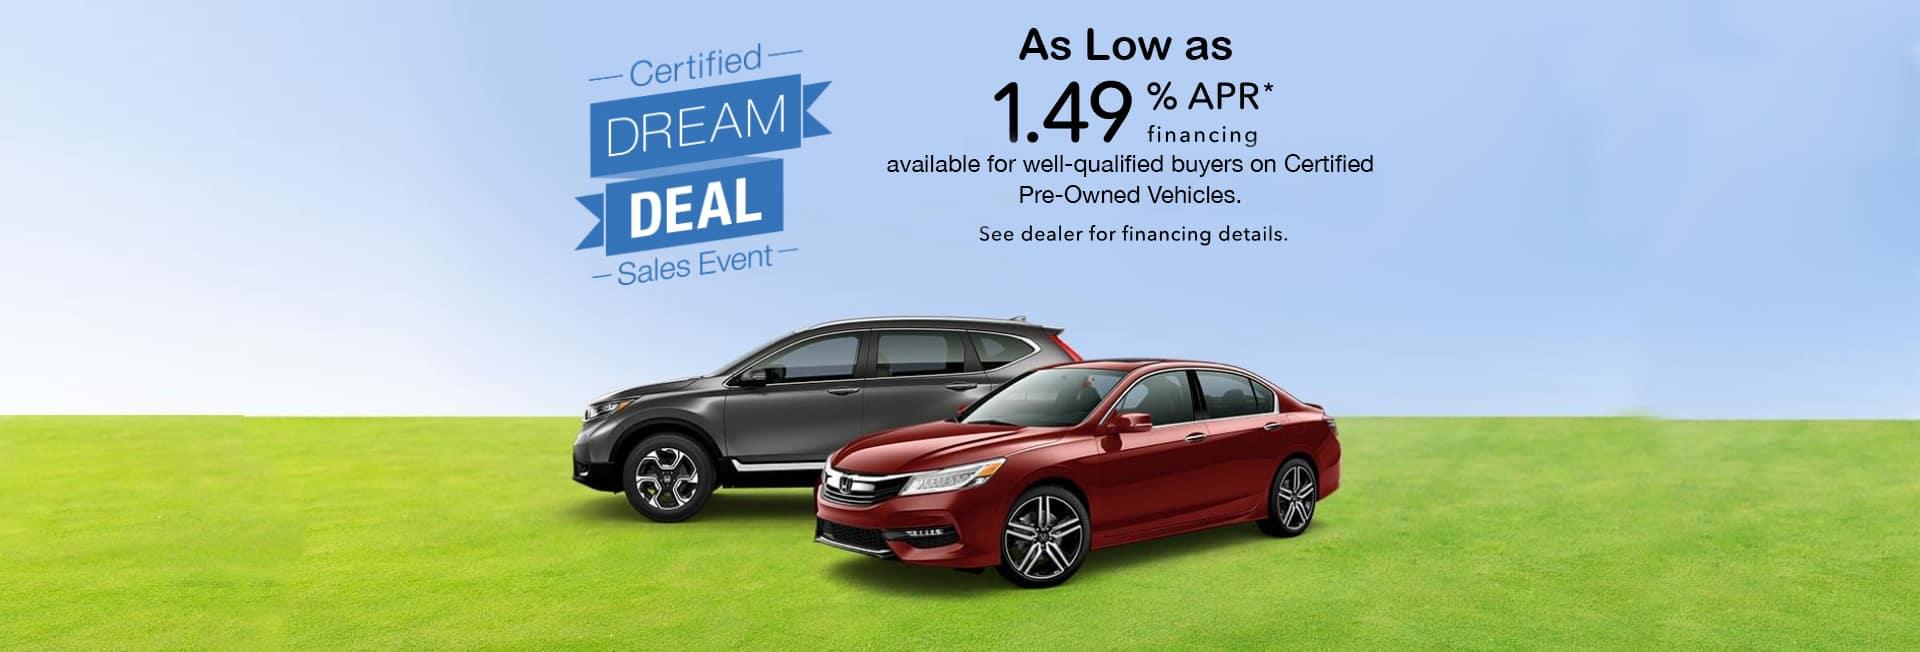 Honda Certified Pre Owned Financing >> Dream Deal Sales Event April 2019 Executive Honda